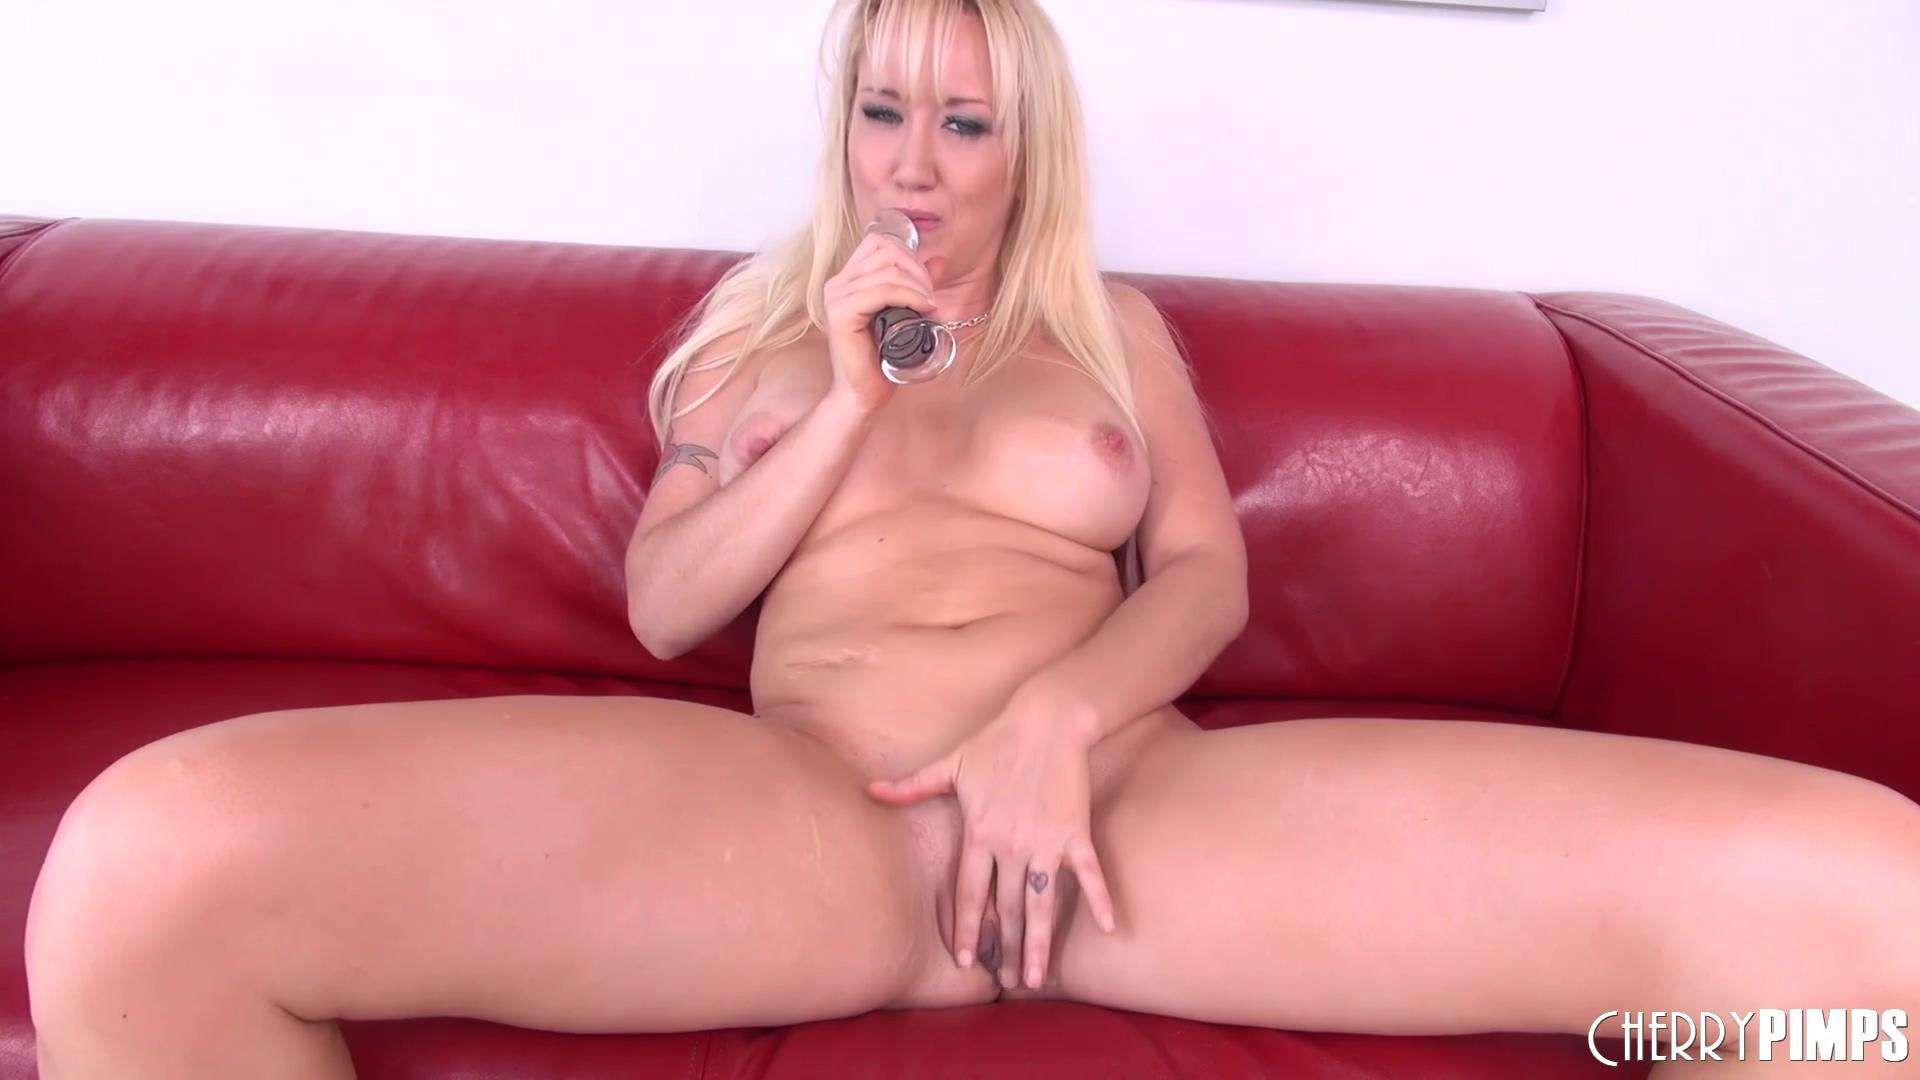 Video 1338985704: alana evans, milf solo big tit, milf solo toy, blonde milf solo, milf solo hd, solo female big tits